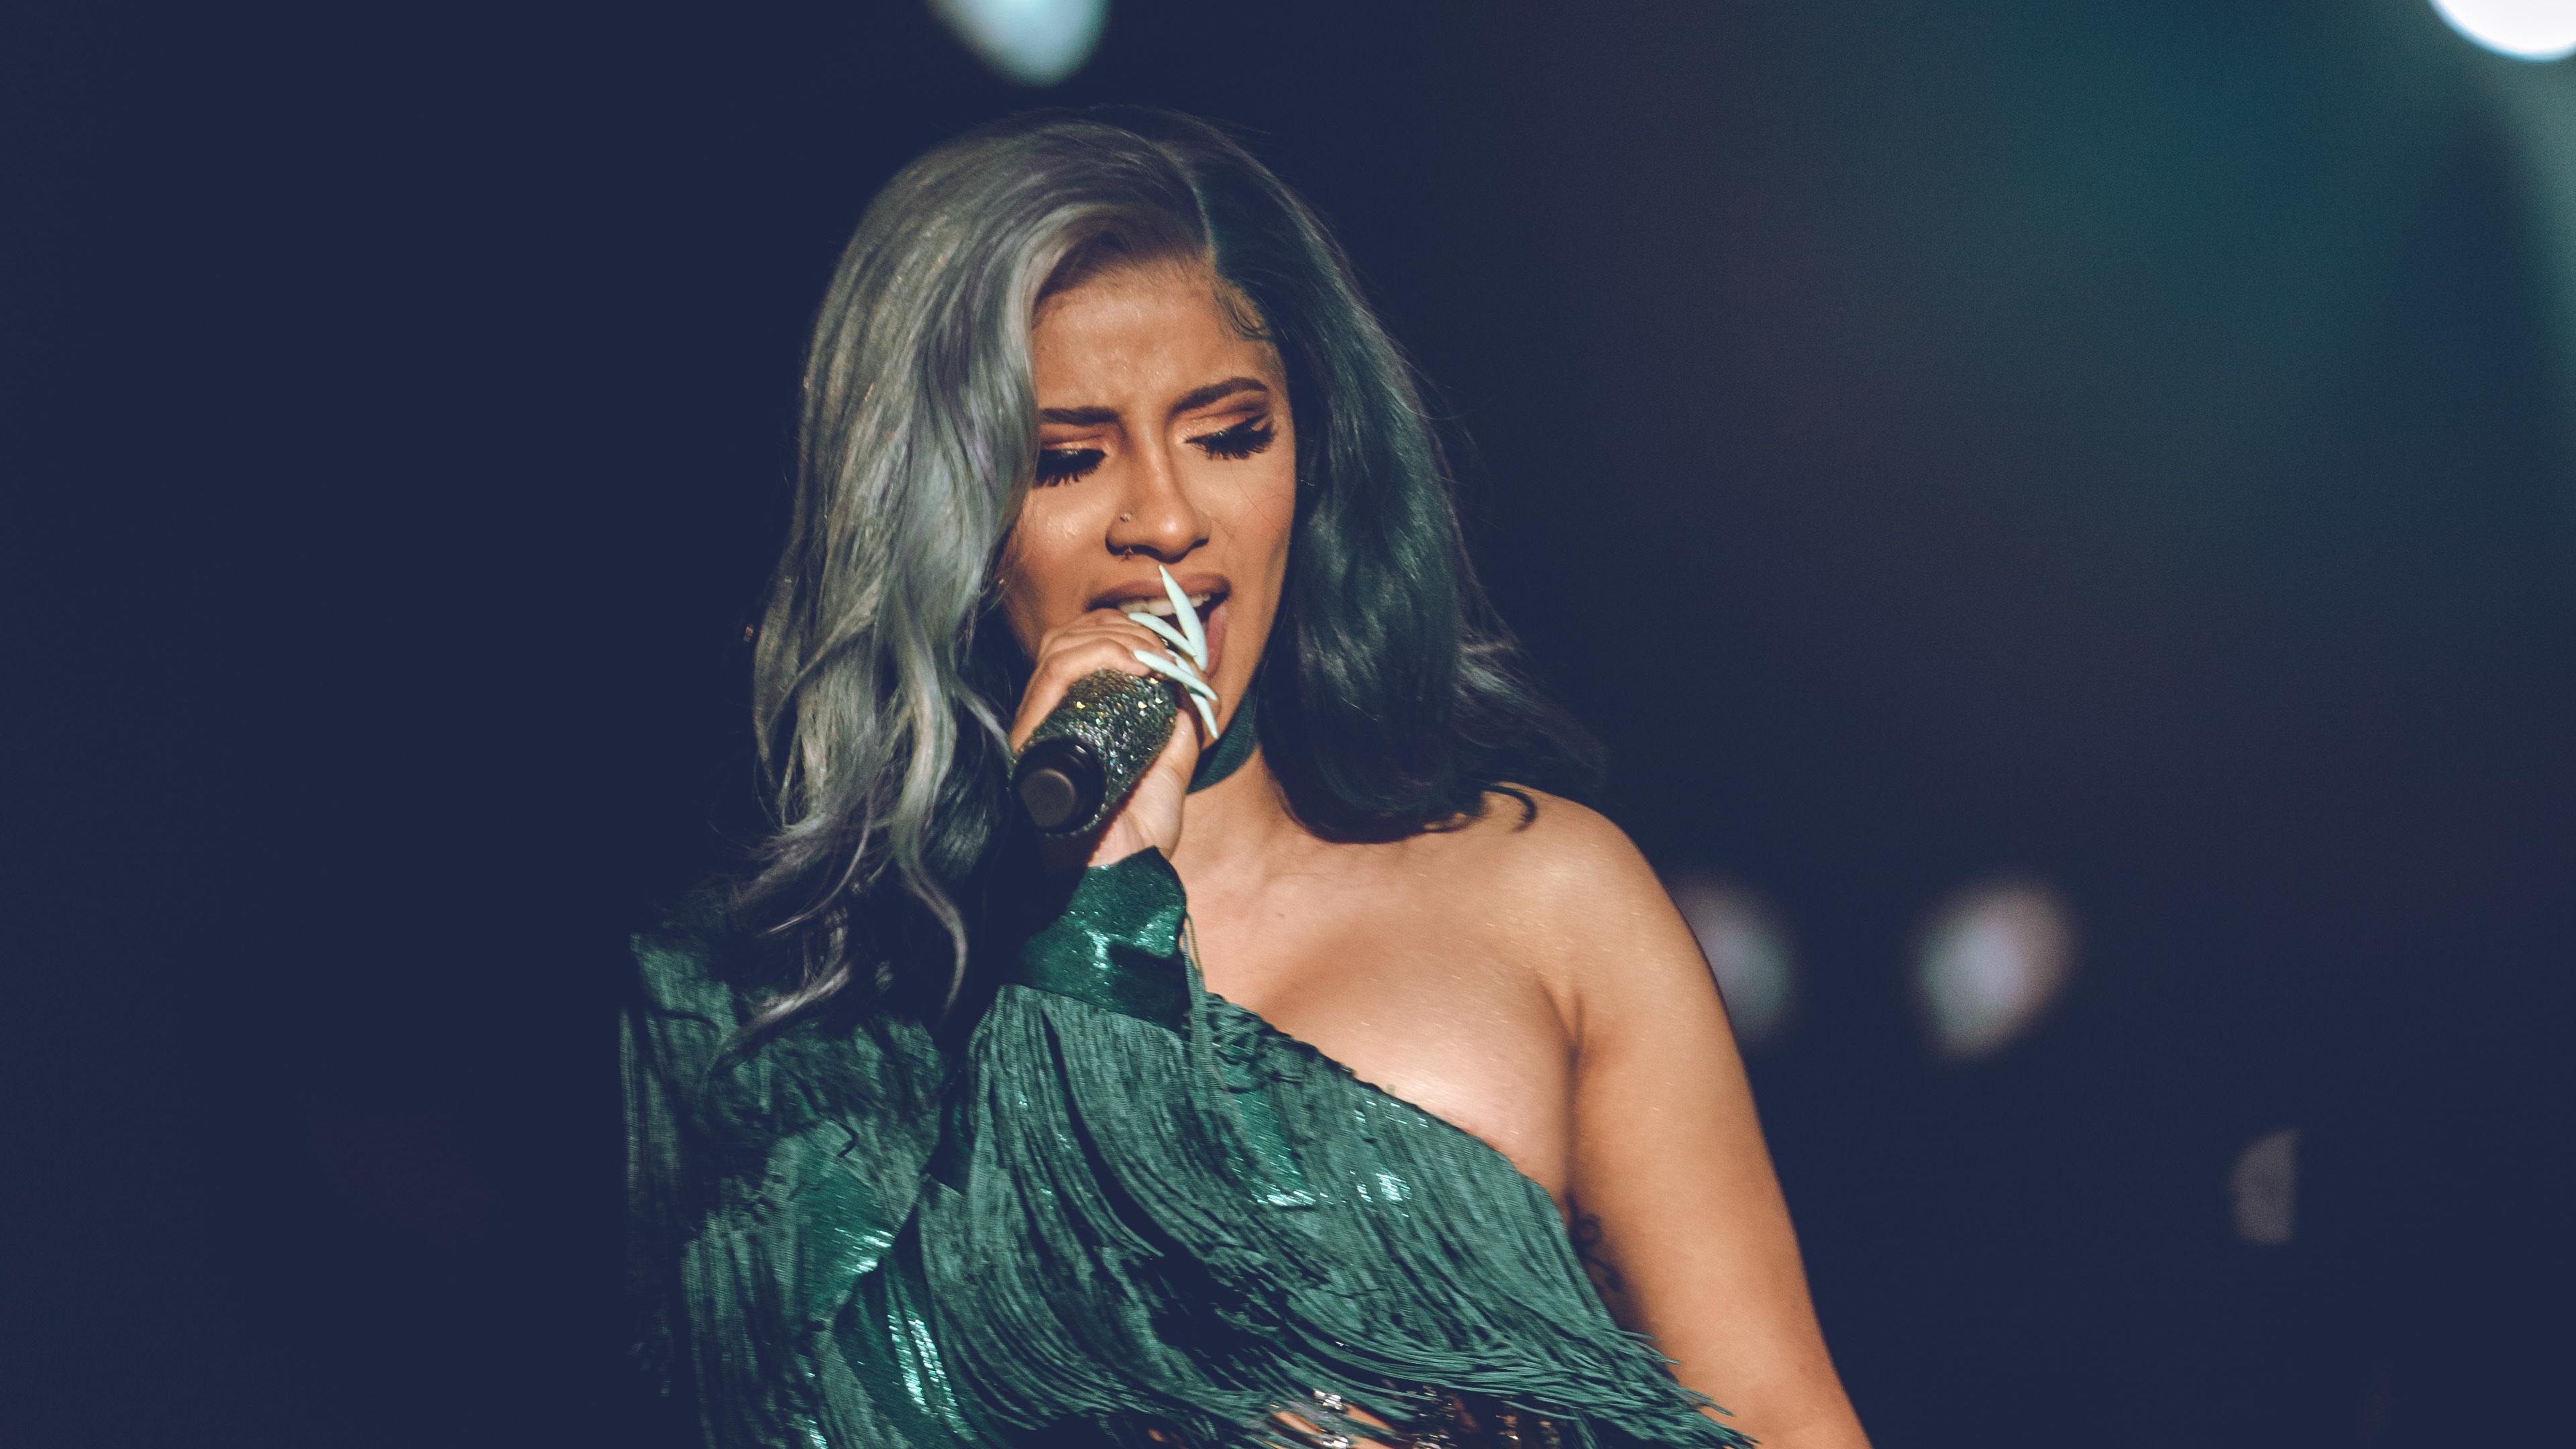 Cardi B on stage during her performance in Lagos, Nigeria | Image: Faje Kashope - @thekashope